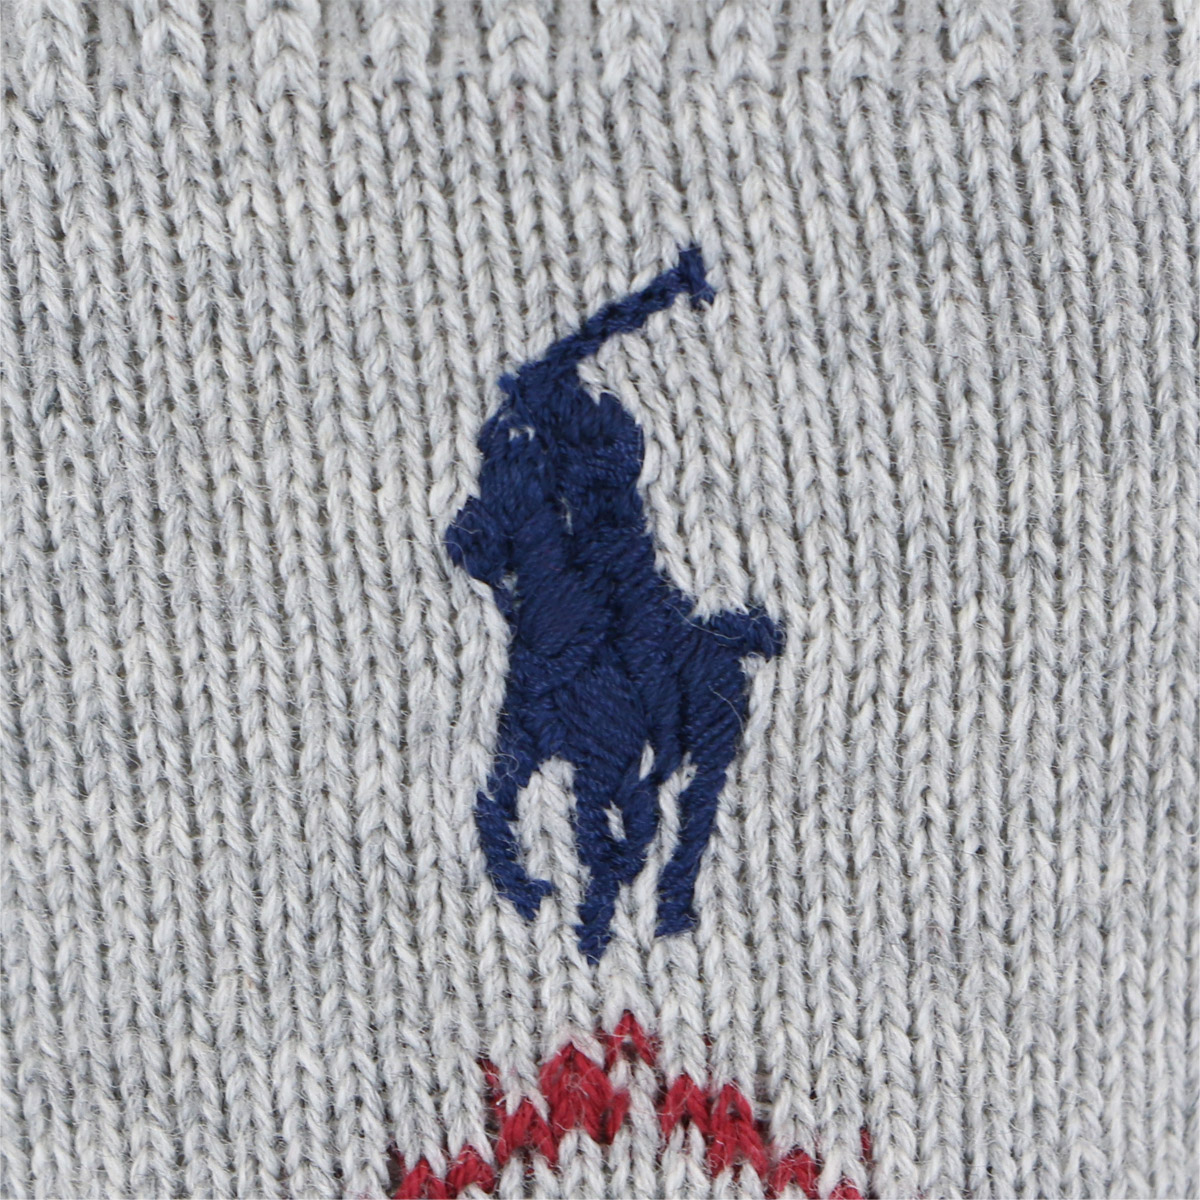 POLO RALPH LAUREN ポロ ラルフローレン キッズ カジュアル クルー ソックス 綿混 ワンポイント刺繍 アーガイル柄 4865-440